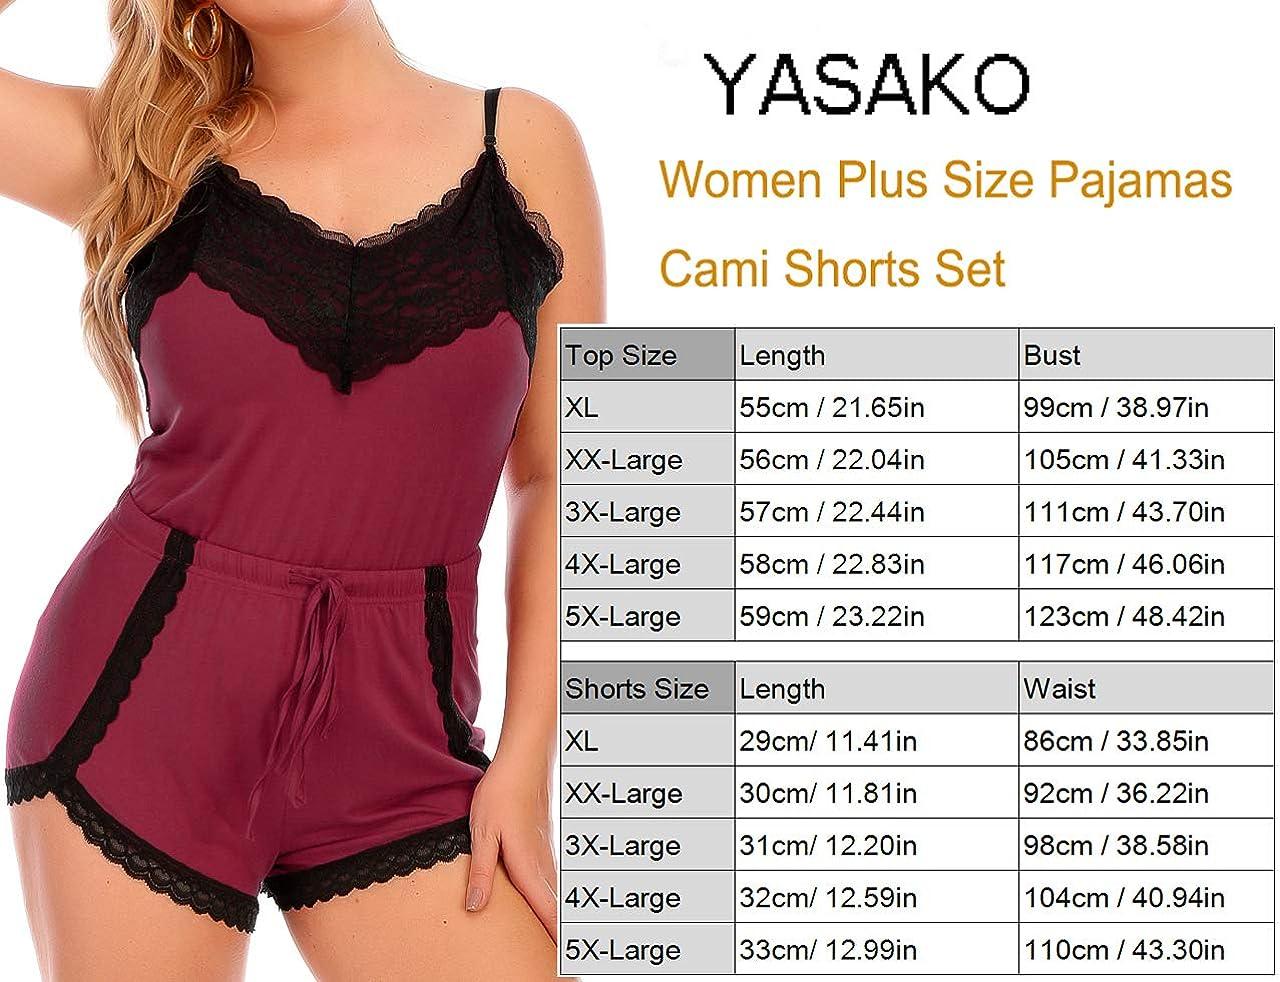 YASAKO Women Plus Size Pajamas Cami Shorts Set Sexy Lace Lingerie Sleepwear with Adjustable Design